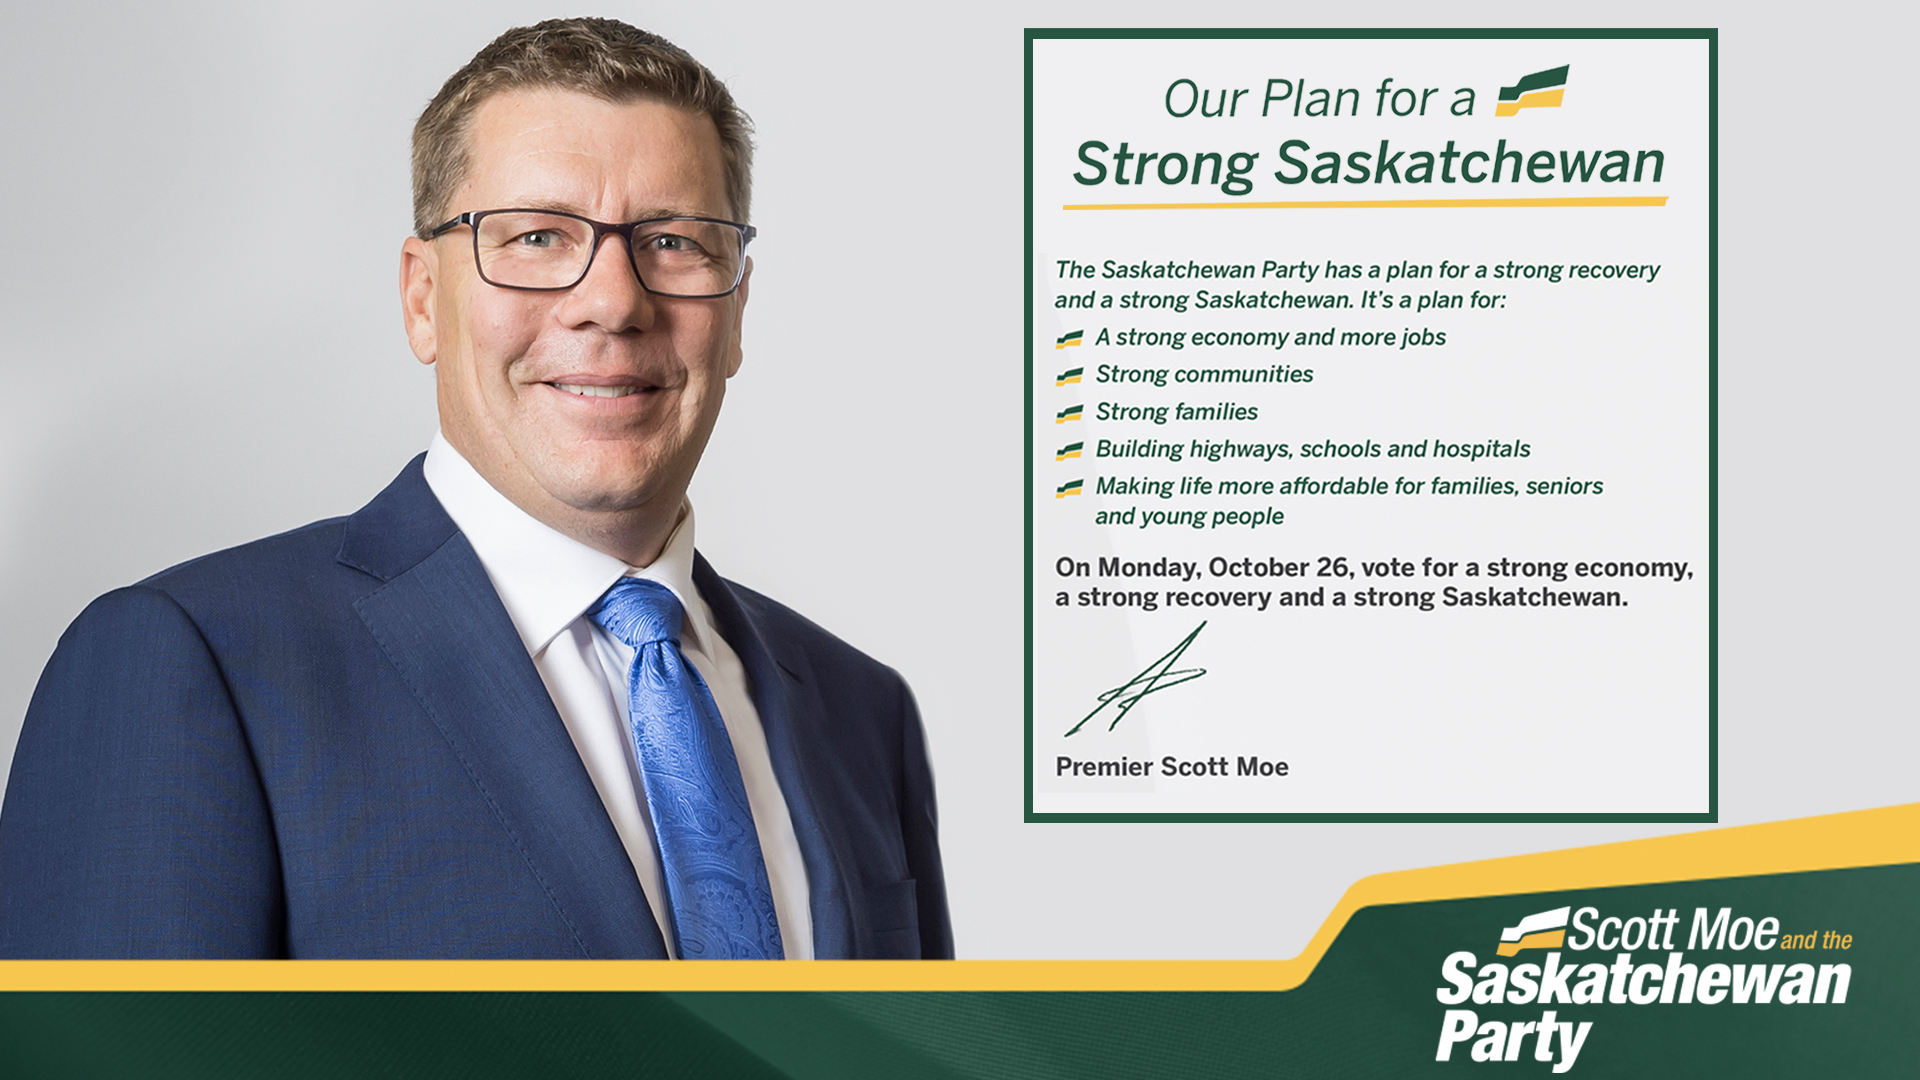 The Saskatchewan Party Platform: